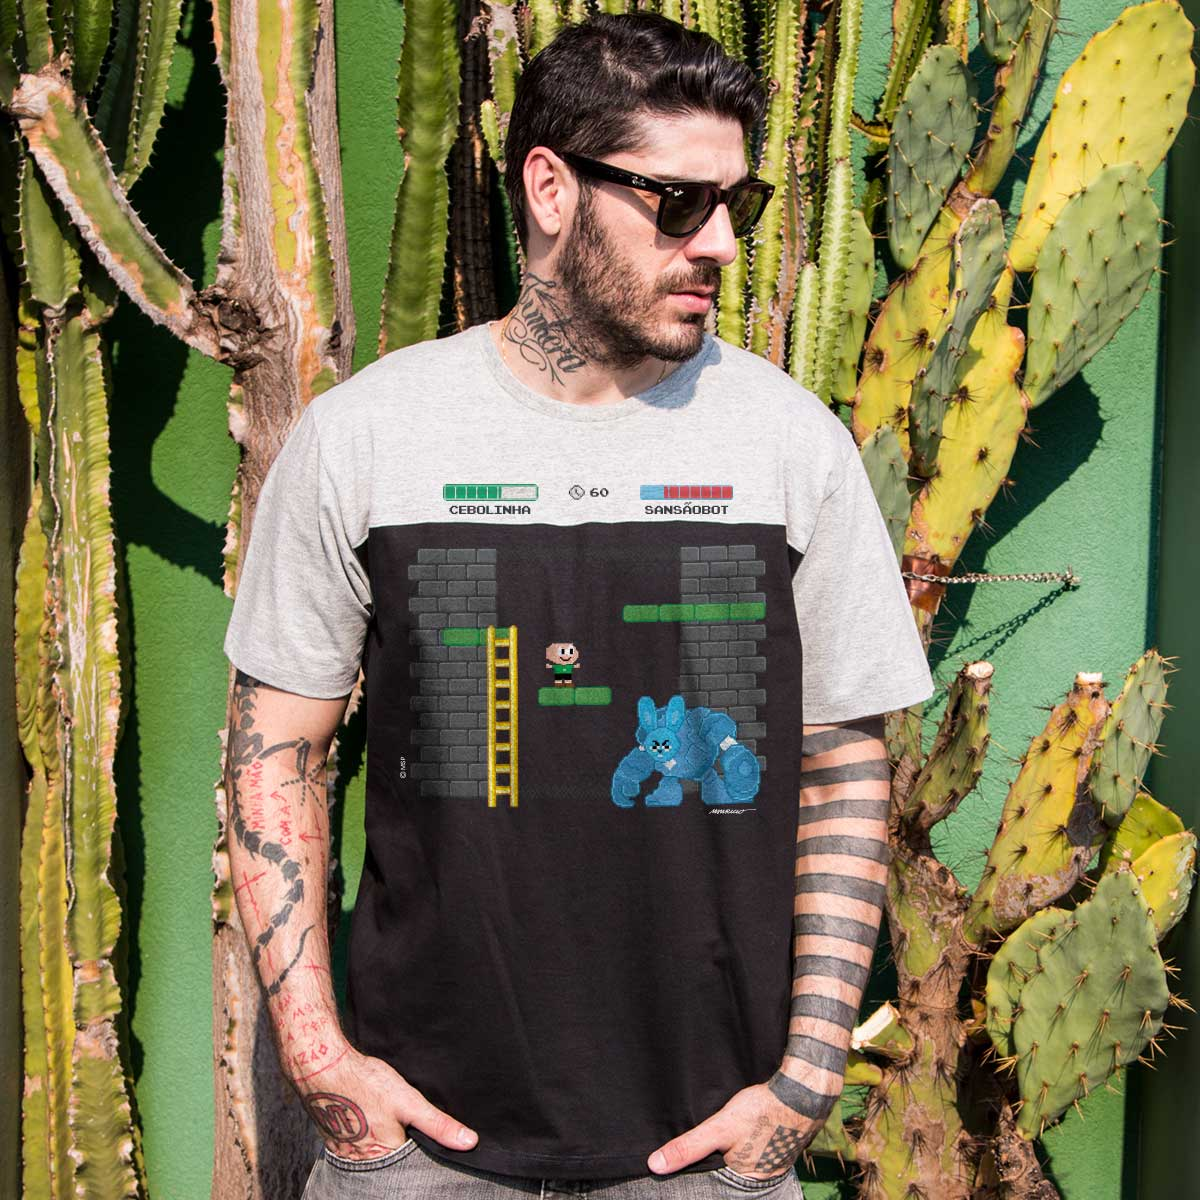 Camiseta Masculina Bicolor Turma da M�nica Cebolinha Sans�oBot